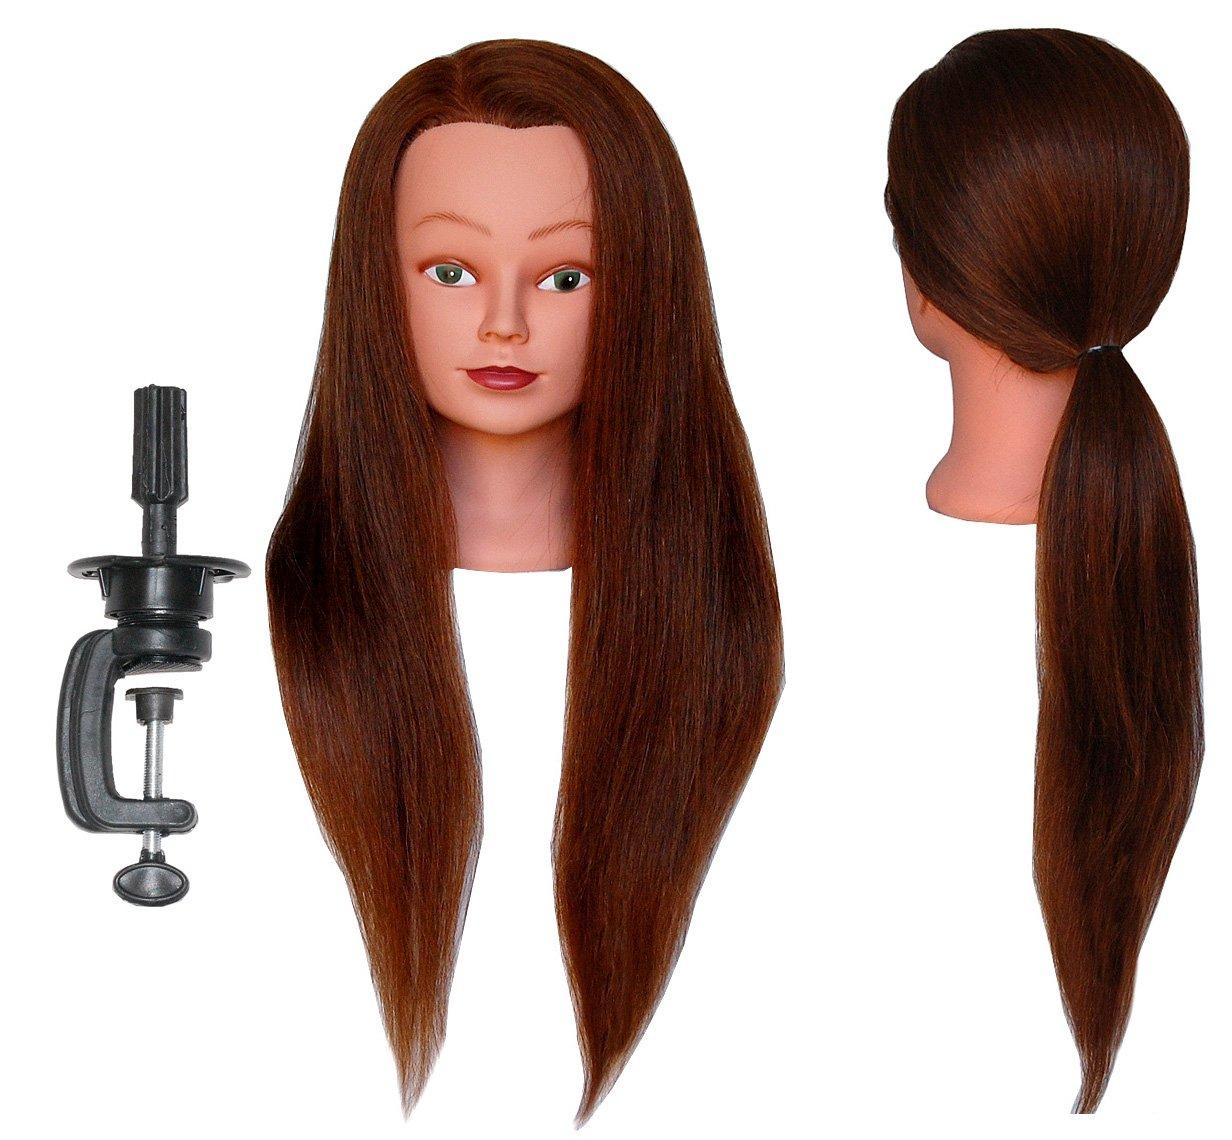 (SUPER LONG) HairZtar 100% Human Hair 26 - 28'' Mannequin Head Hairdresser Training Head Manikin Cosmetology Doll Head (LUCY+CLAMP)